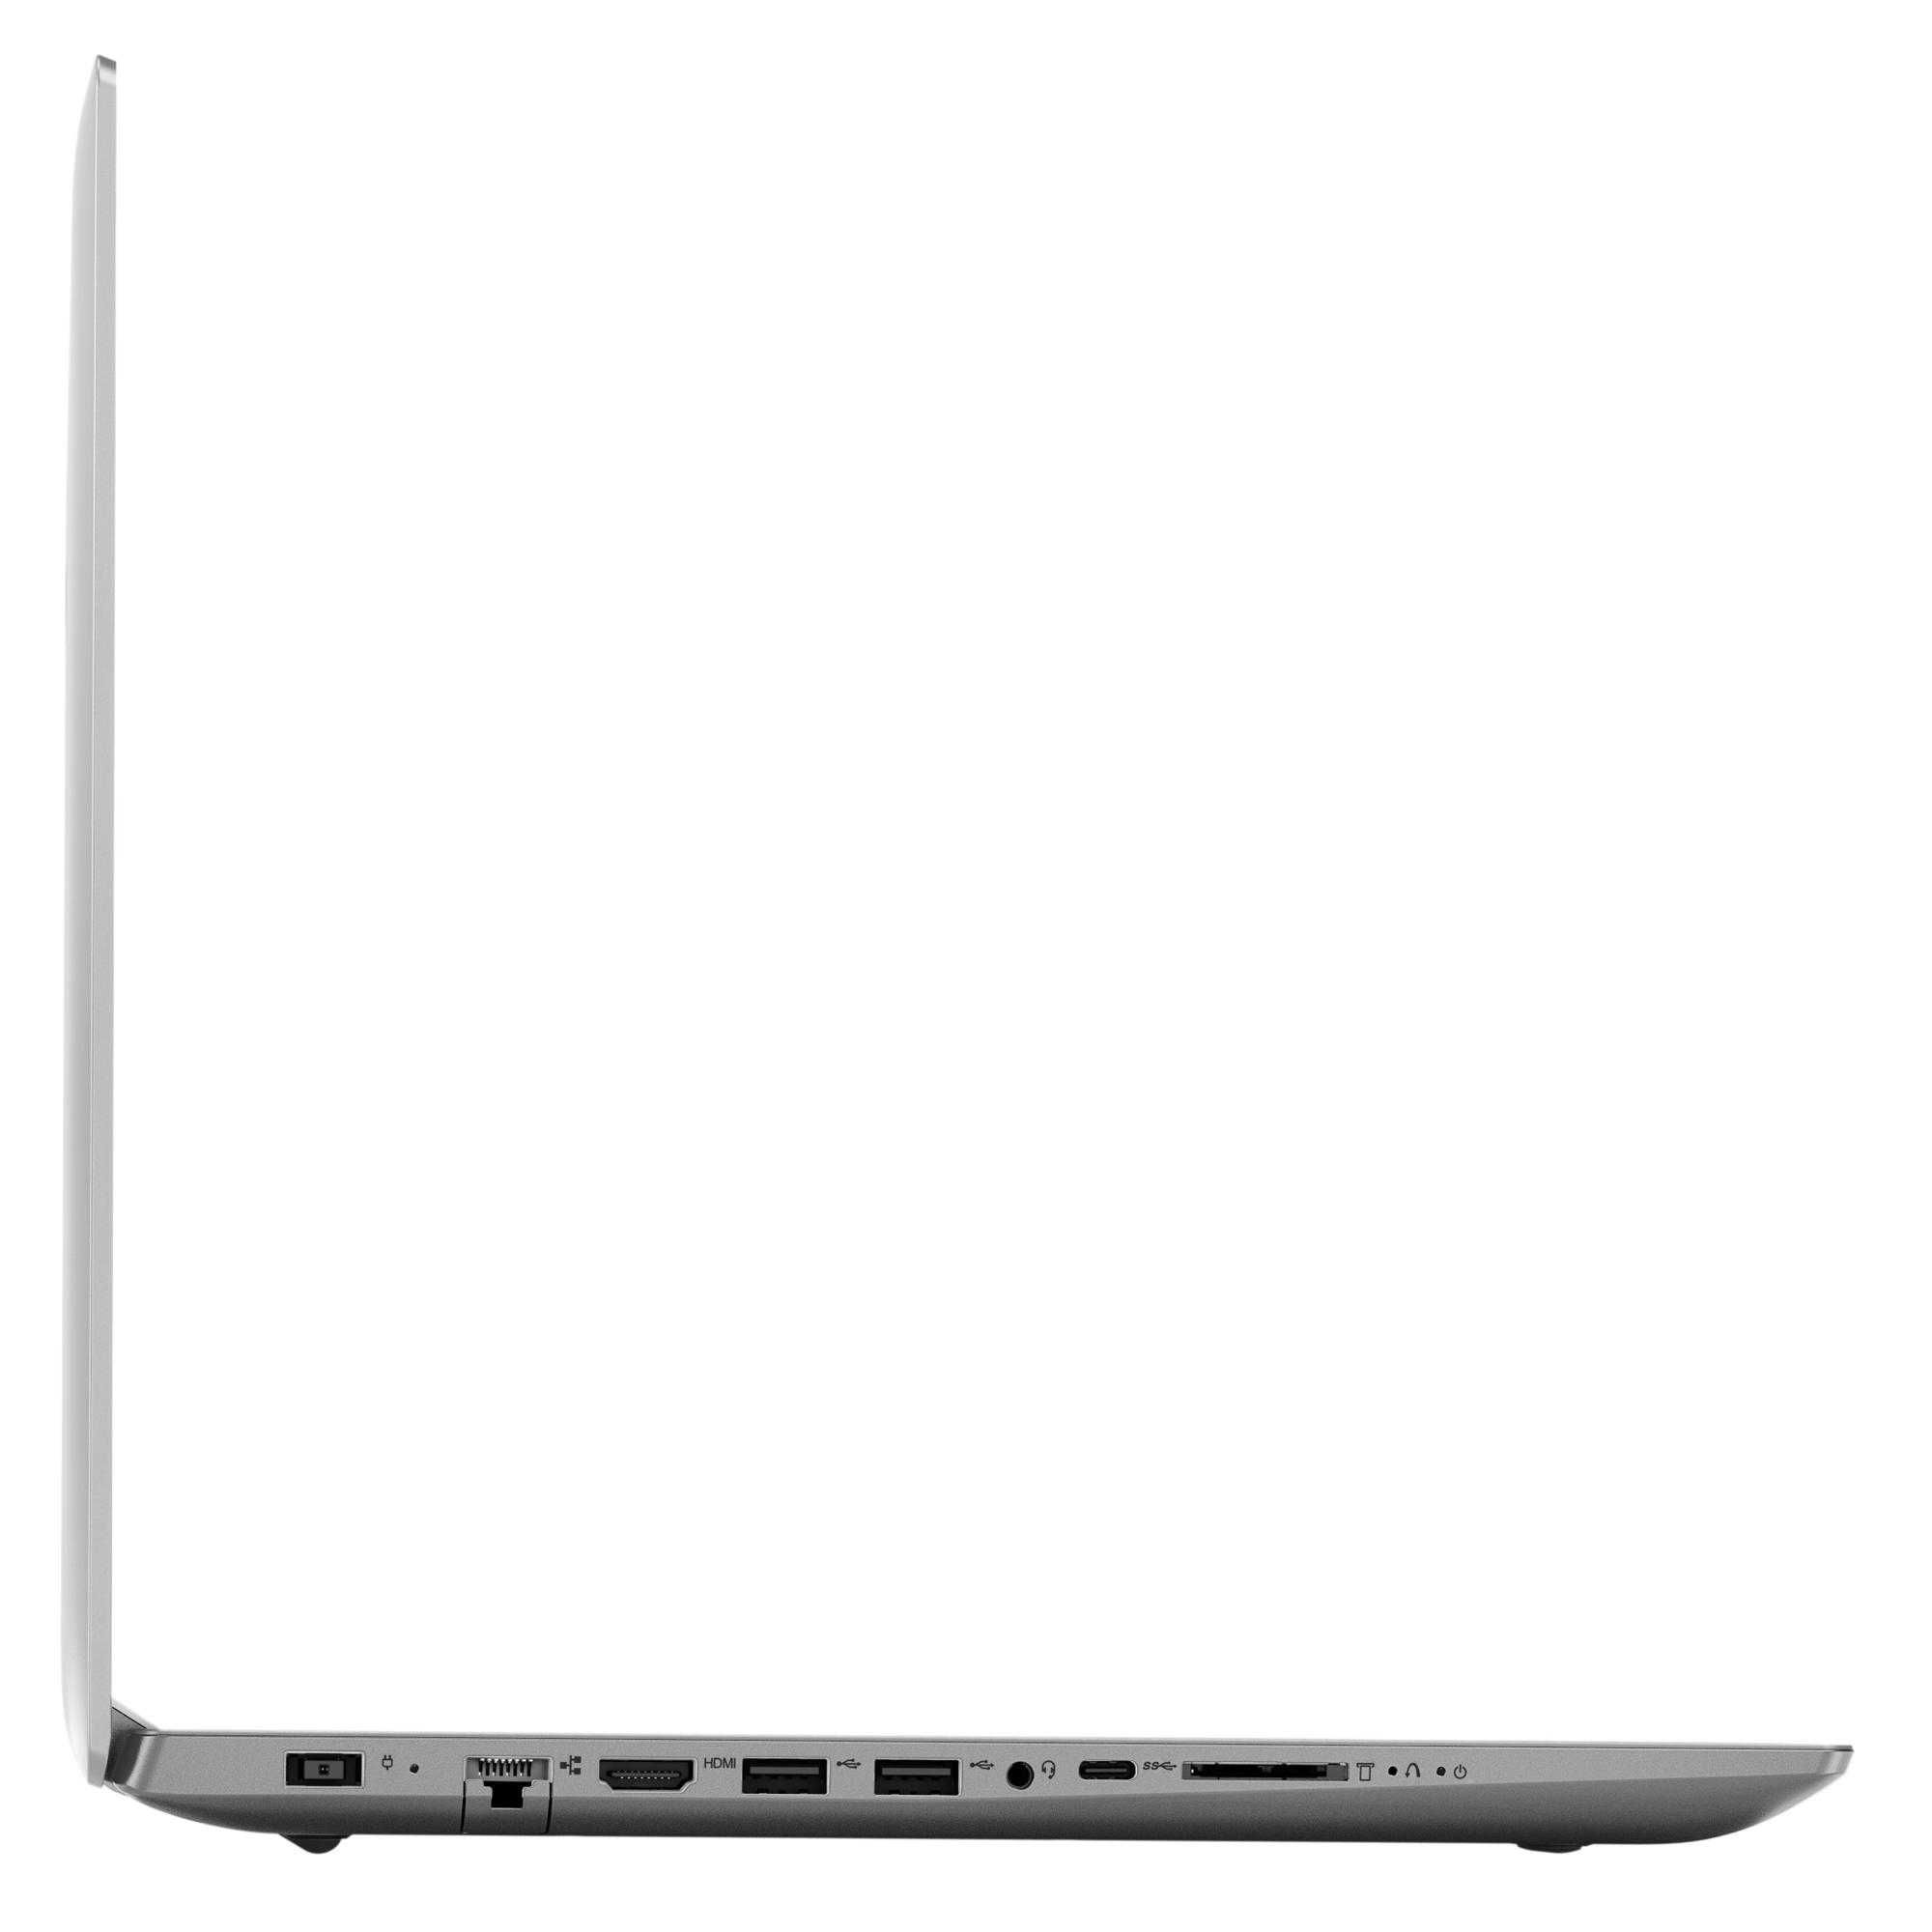 Фото  Ноутбук Lenovo ideapad 330-15IKB Platinum Grey (81DE01R2RU)